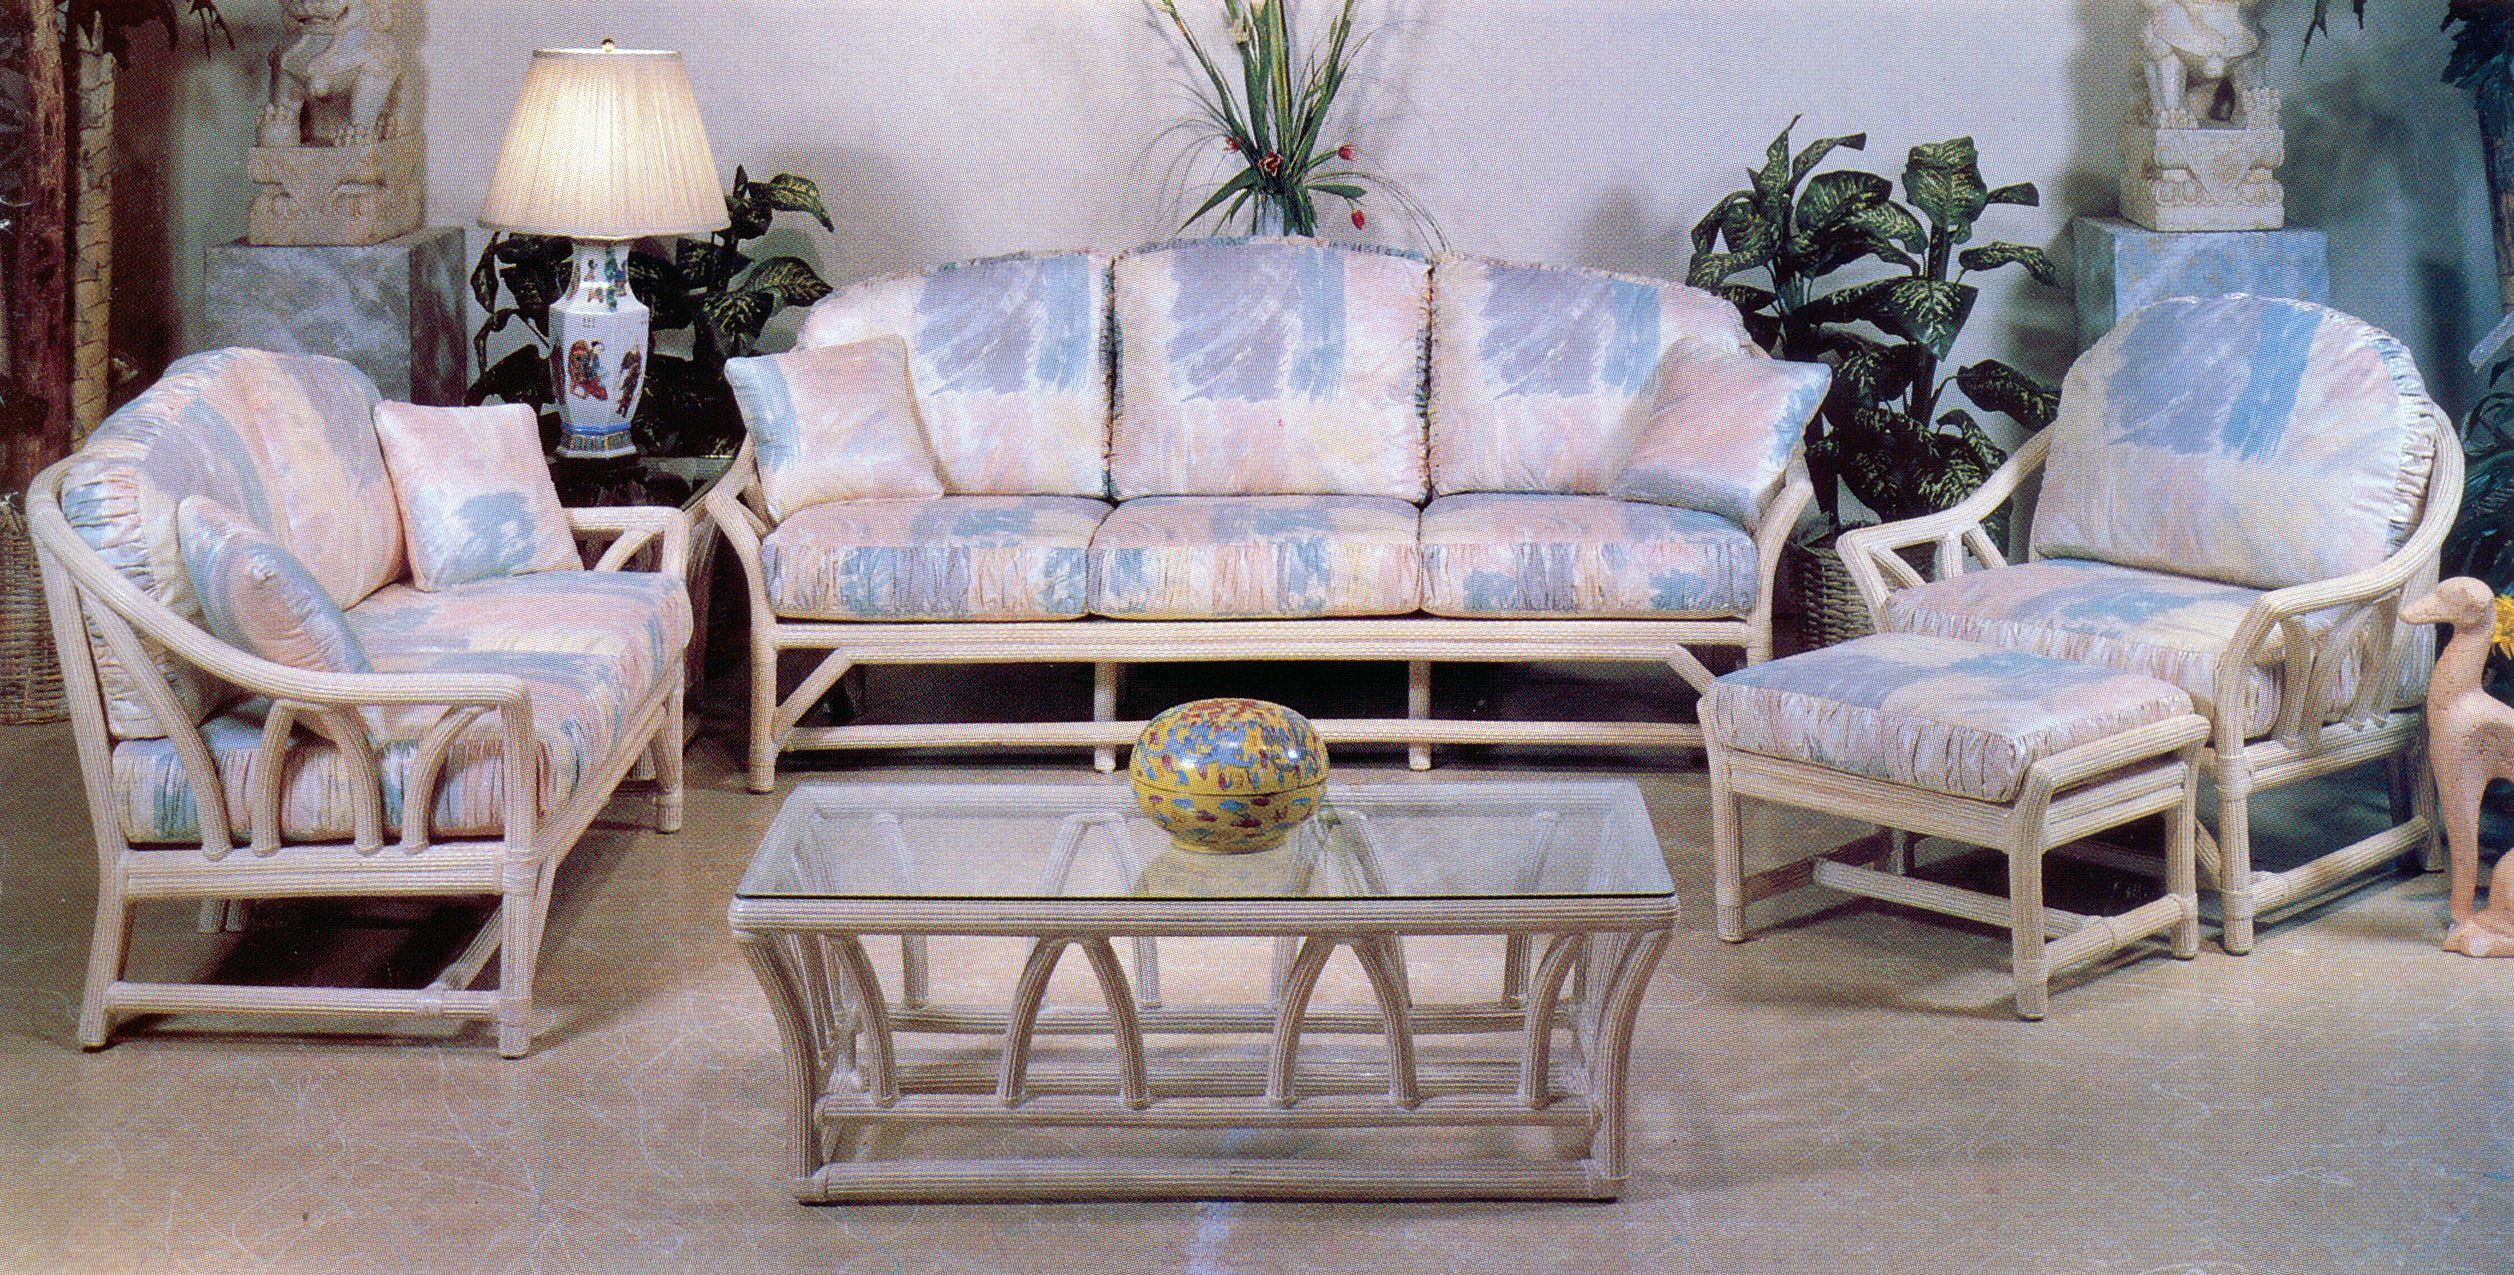 Rattan Furniture By Ayers · Bamboo FurnitureModern PatioPottery Barn MagnoliaTropical